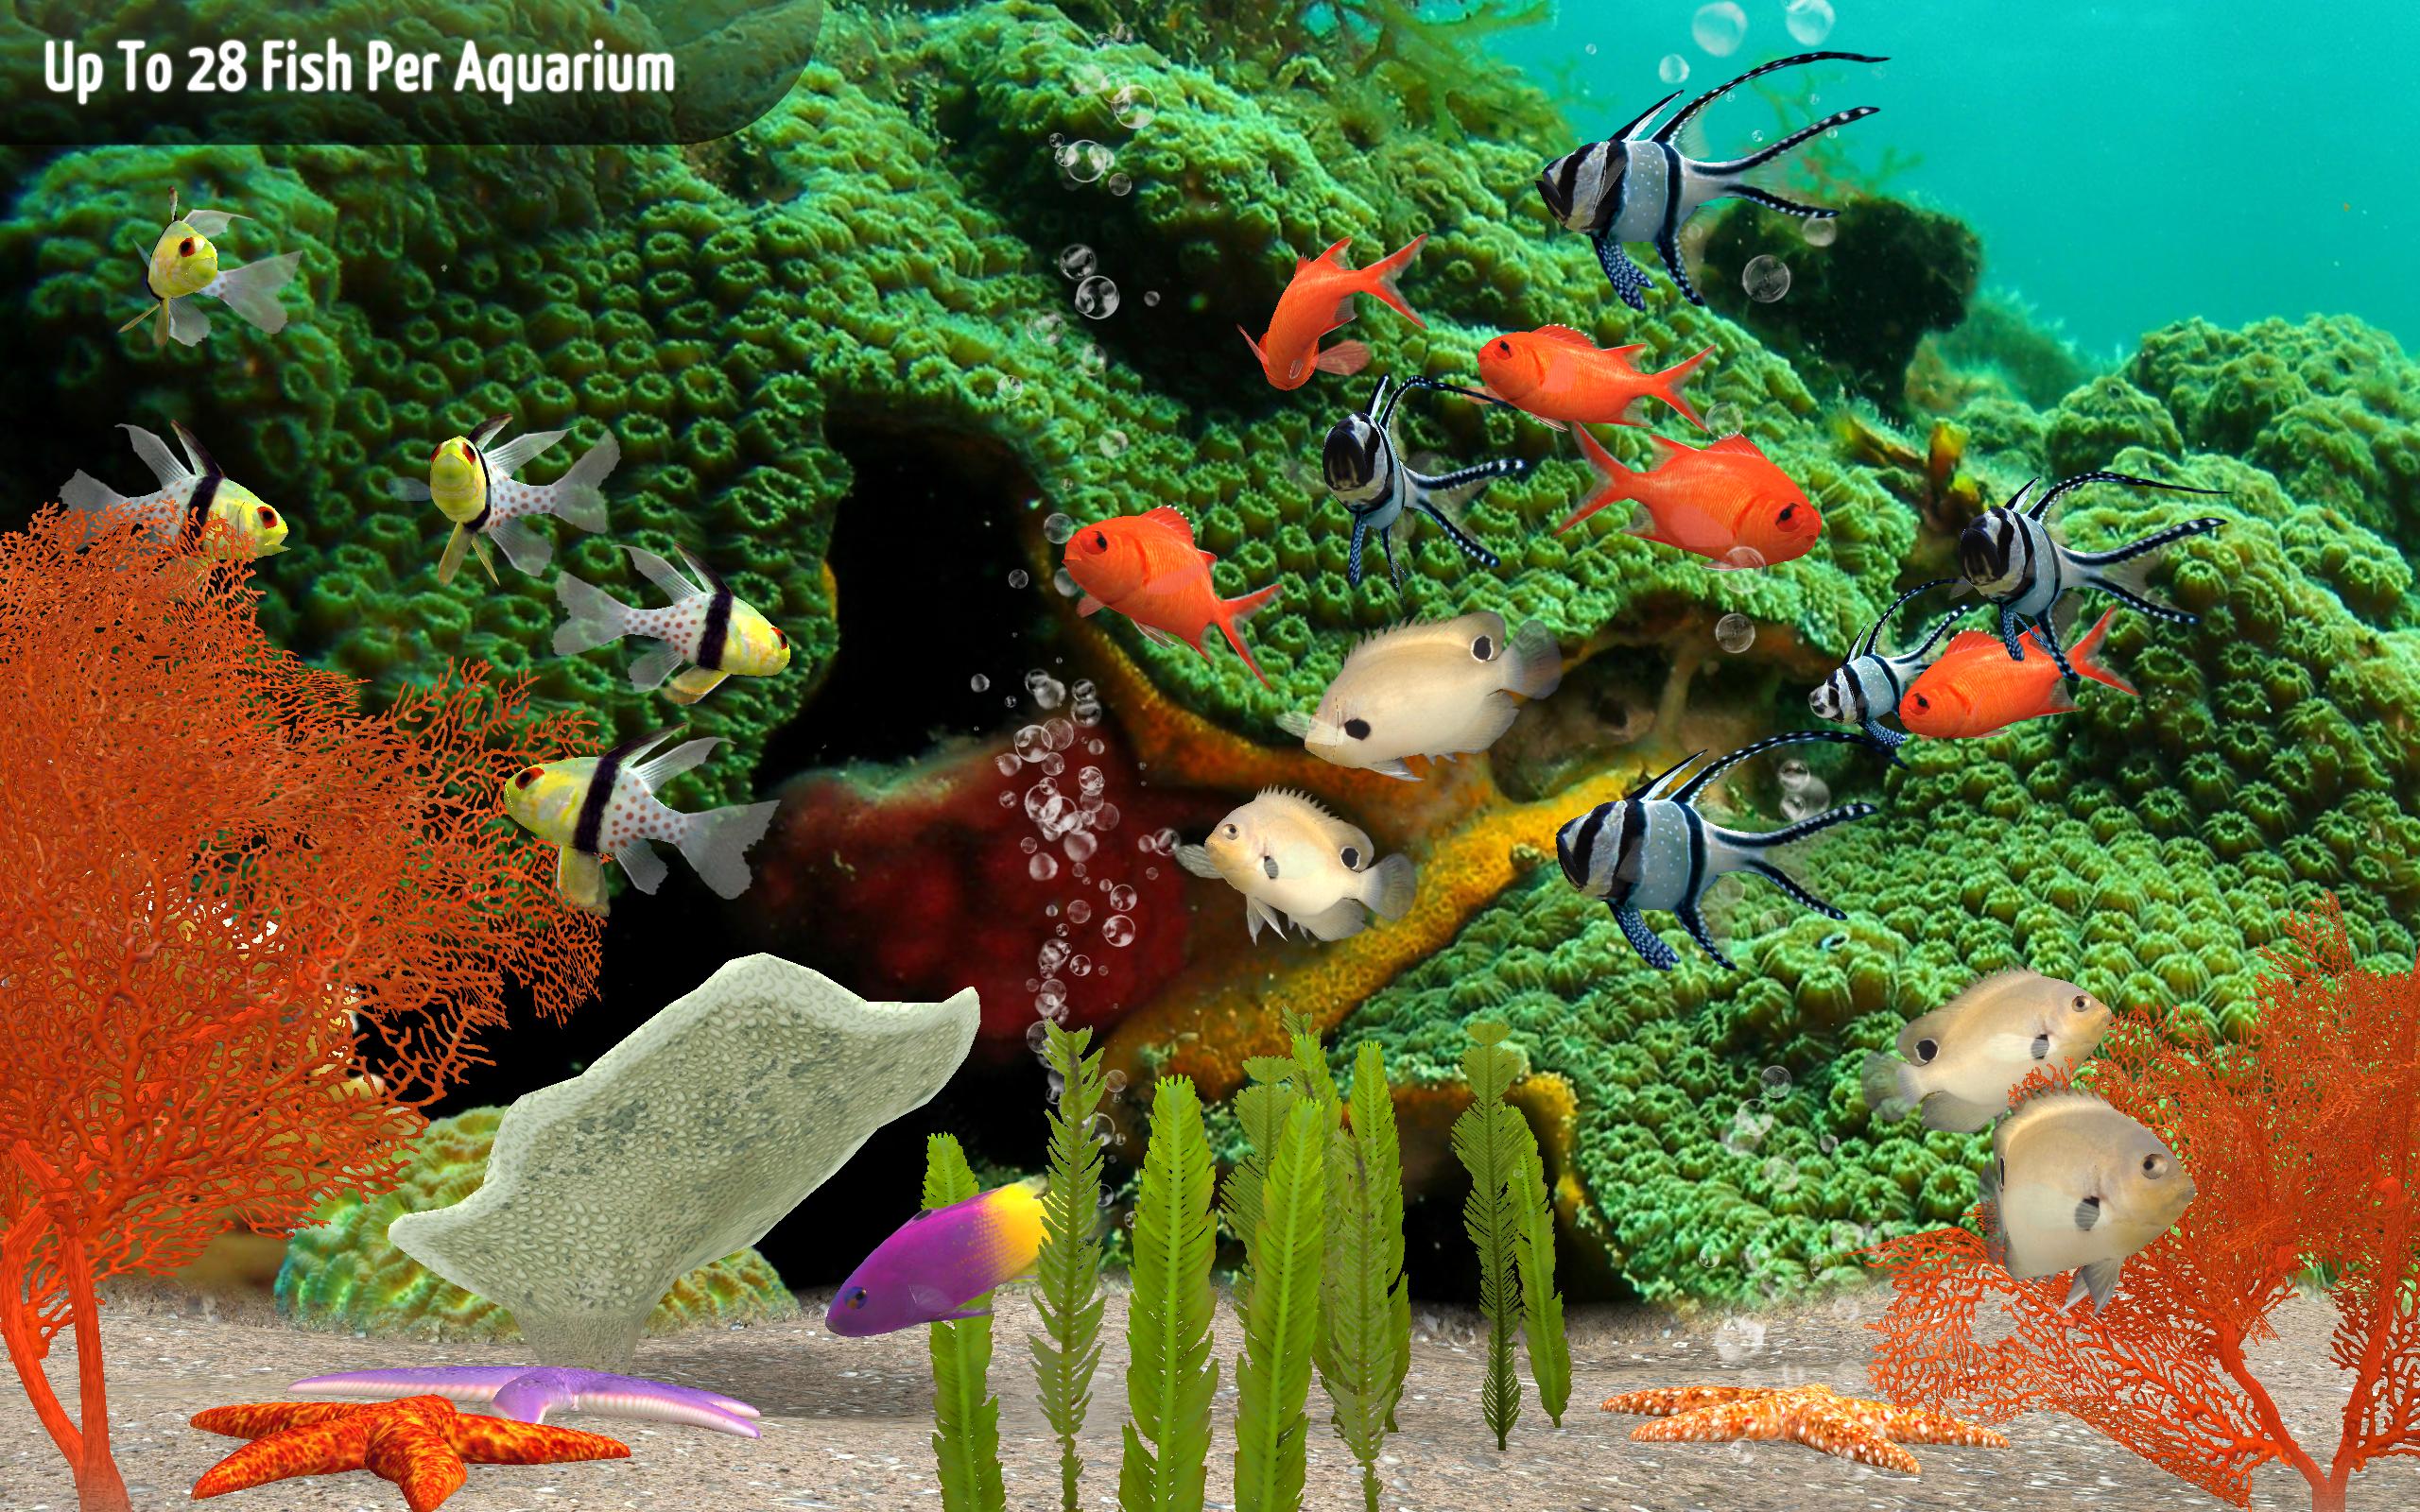 Fish aquarium olx delhi - Fish Aquarium Olx Delhi